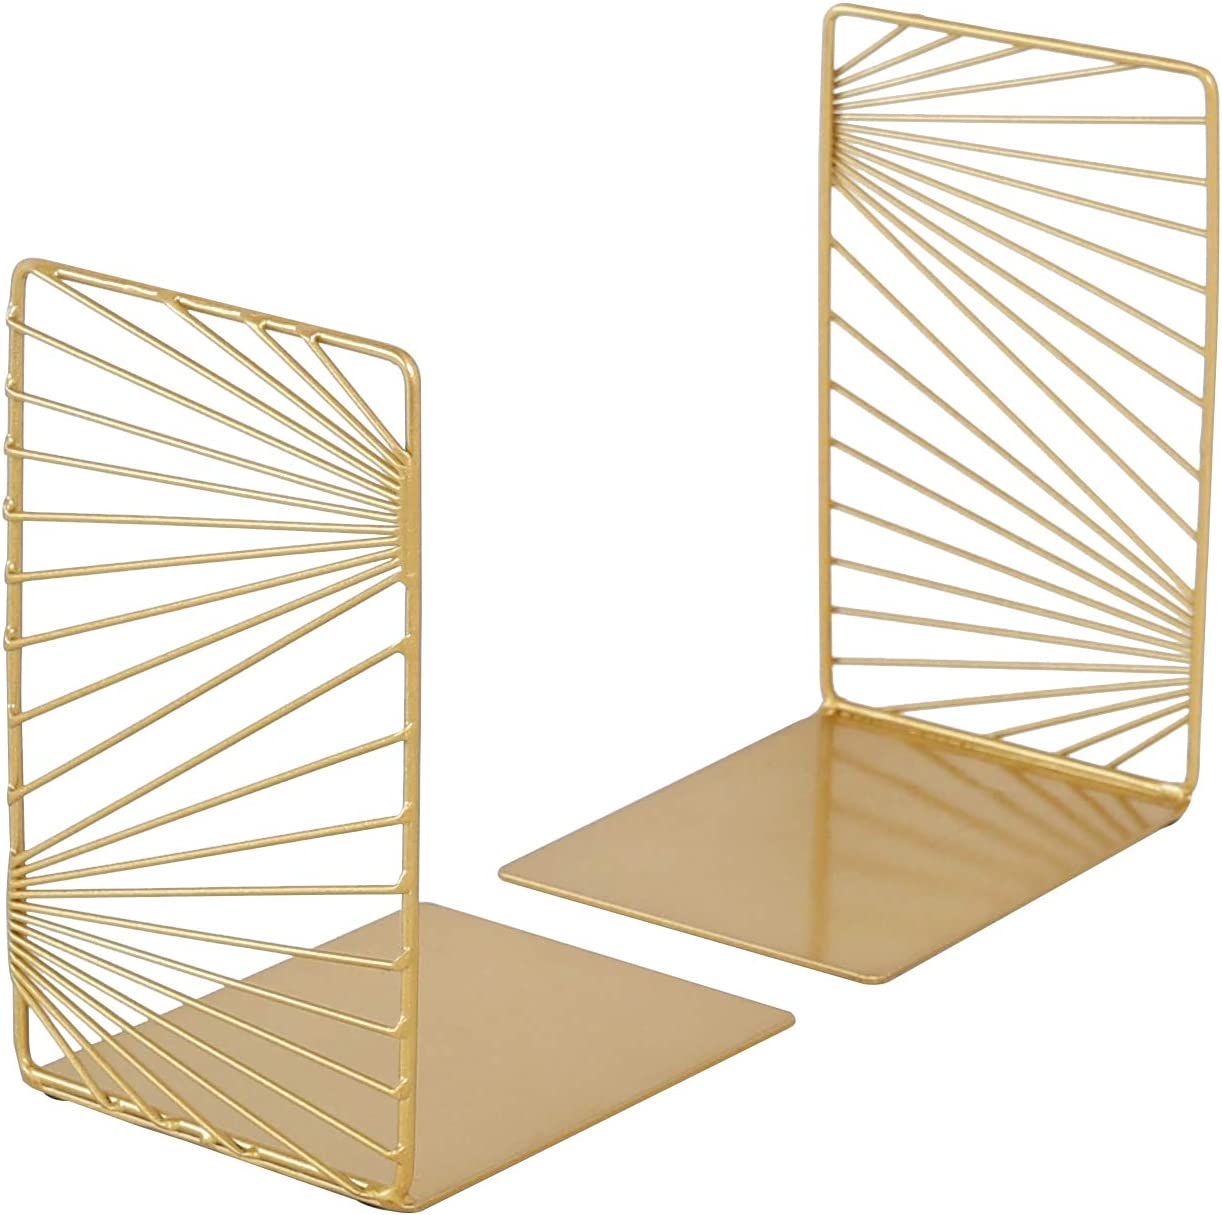 zennd. Gold Decorative Bookends - 2pc Modern Design Book Stopper Set   Metal Book Ends for Office, Book Ends for Home, Book Holders for Shelves (Gold)